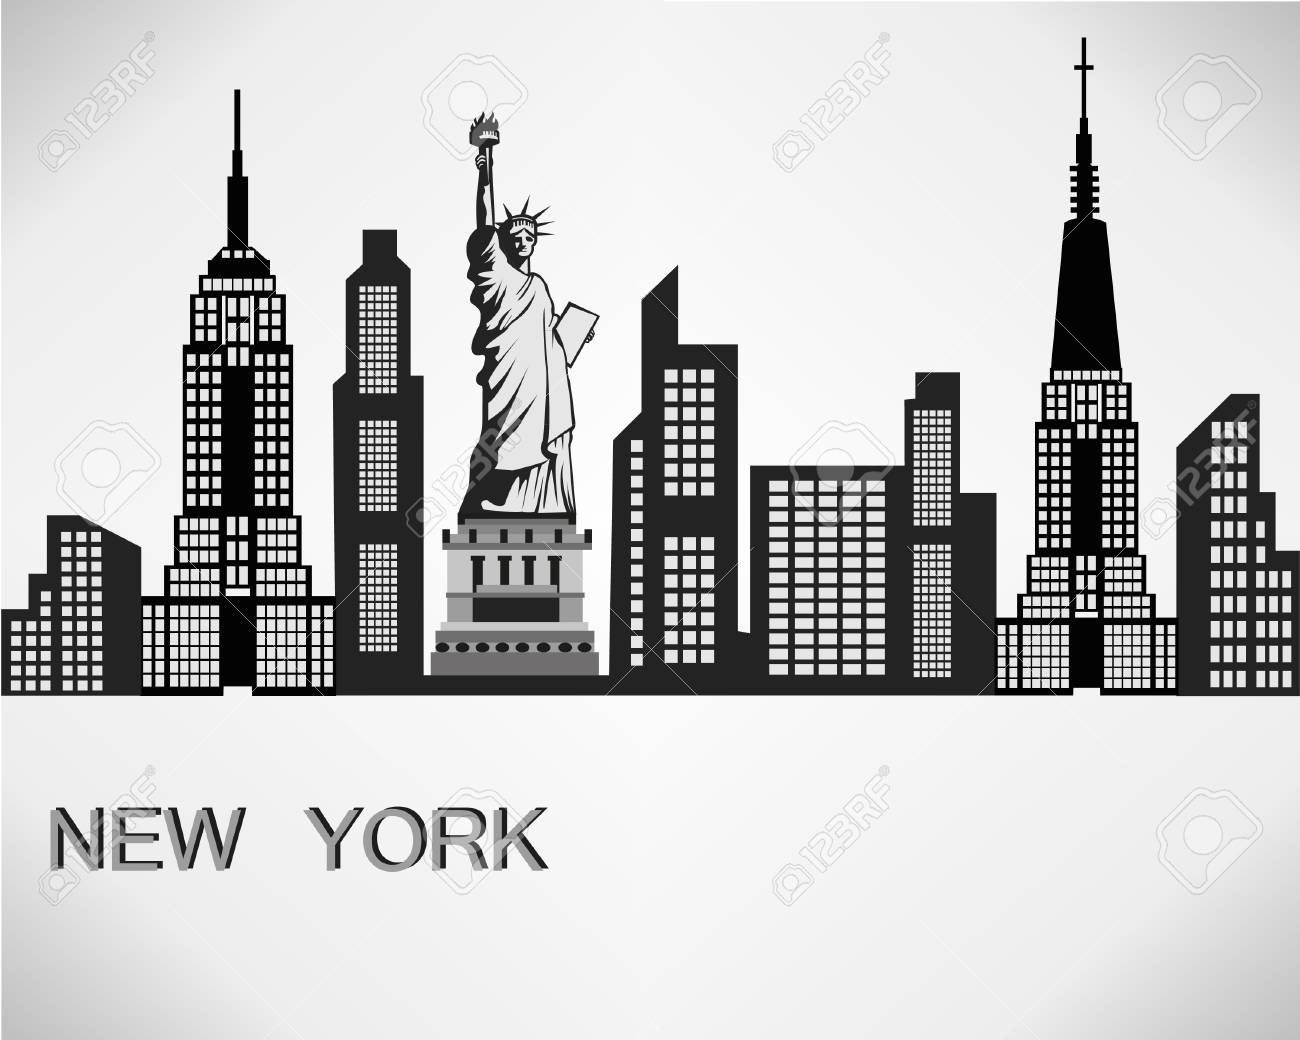 new york city skyline detailed silhouette vector illustration rh 123rf com new york skyline outline vector new york skyline vector free